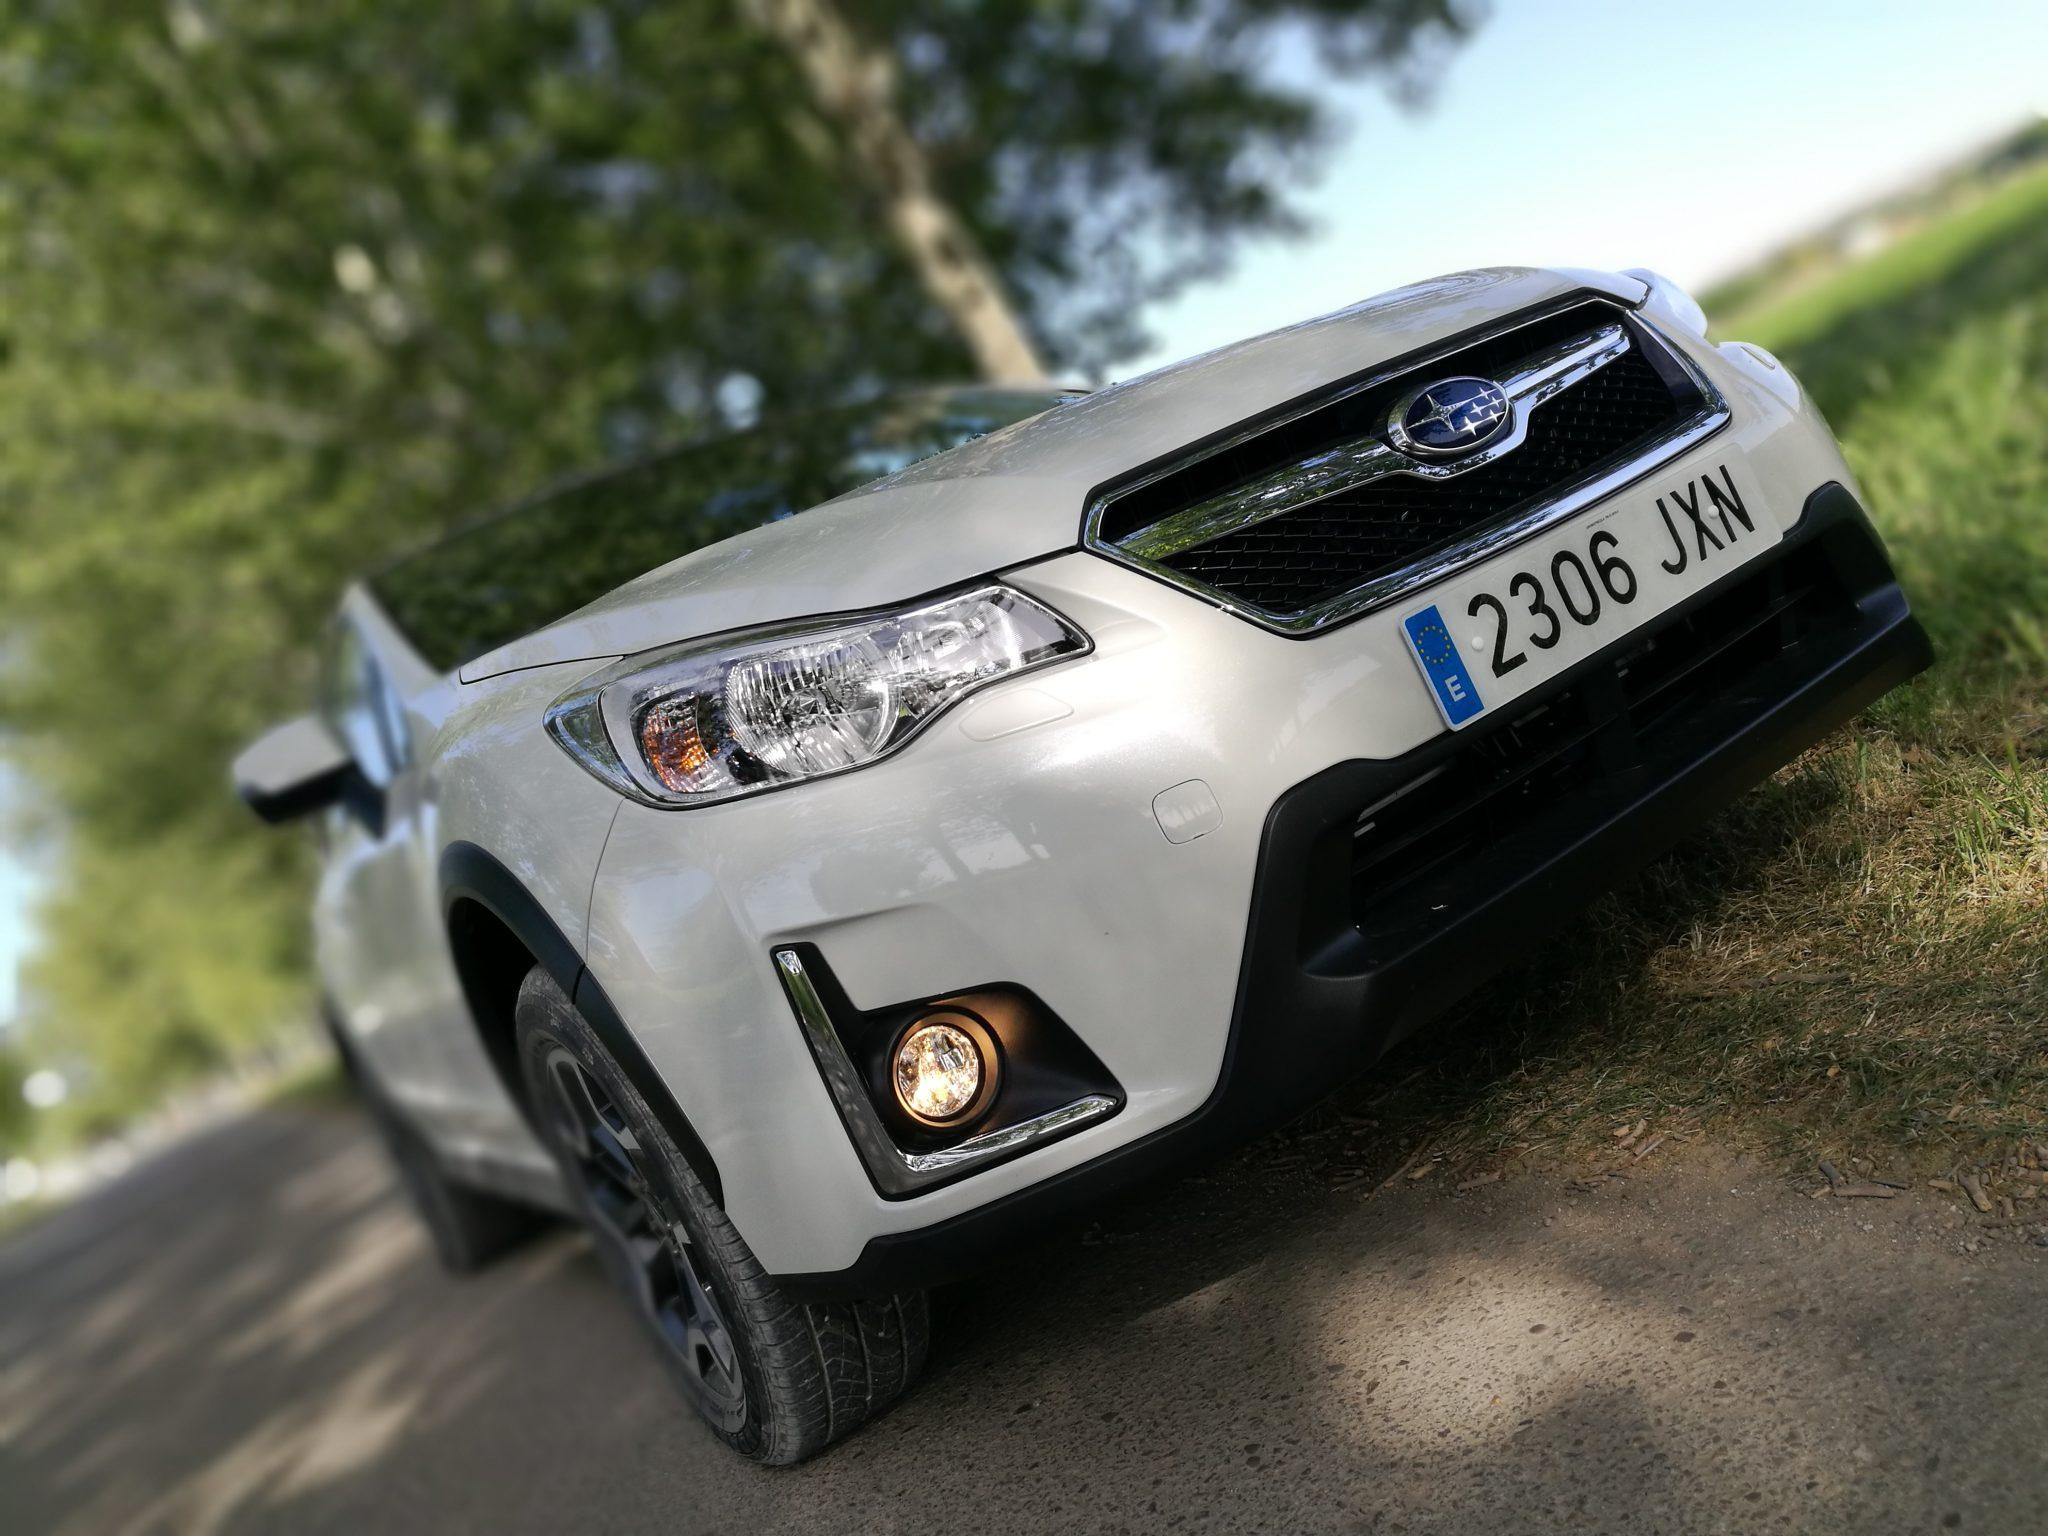 Subaru XV Boxer Diesel frontal 2 CAR and GAS